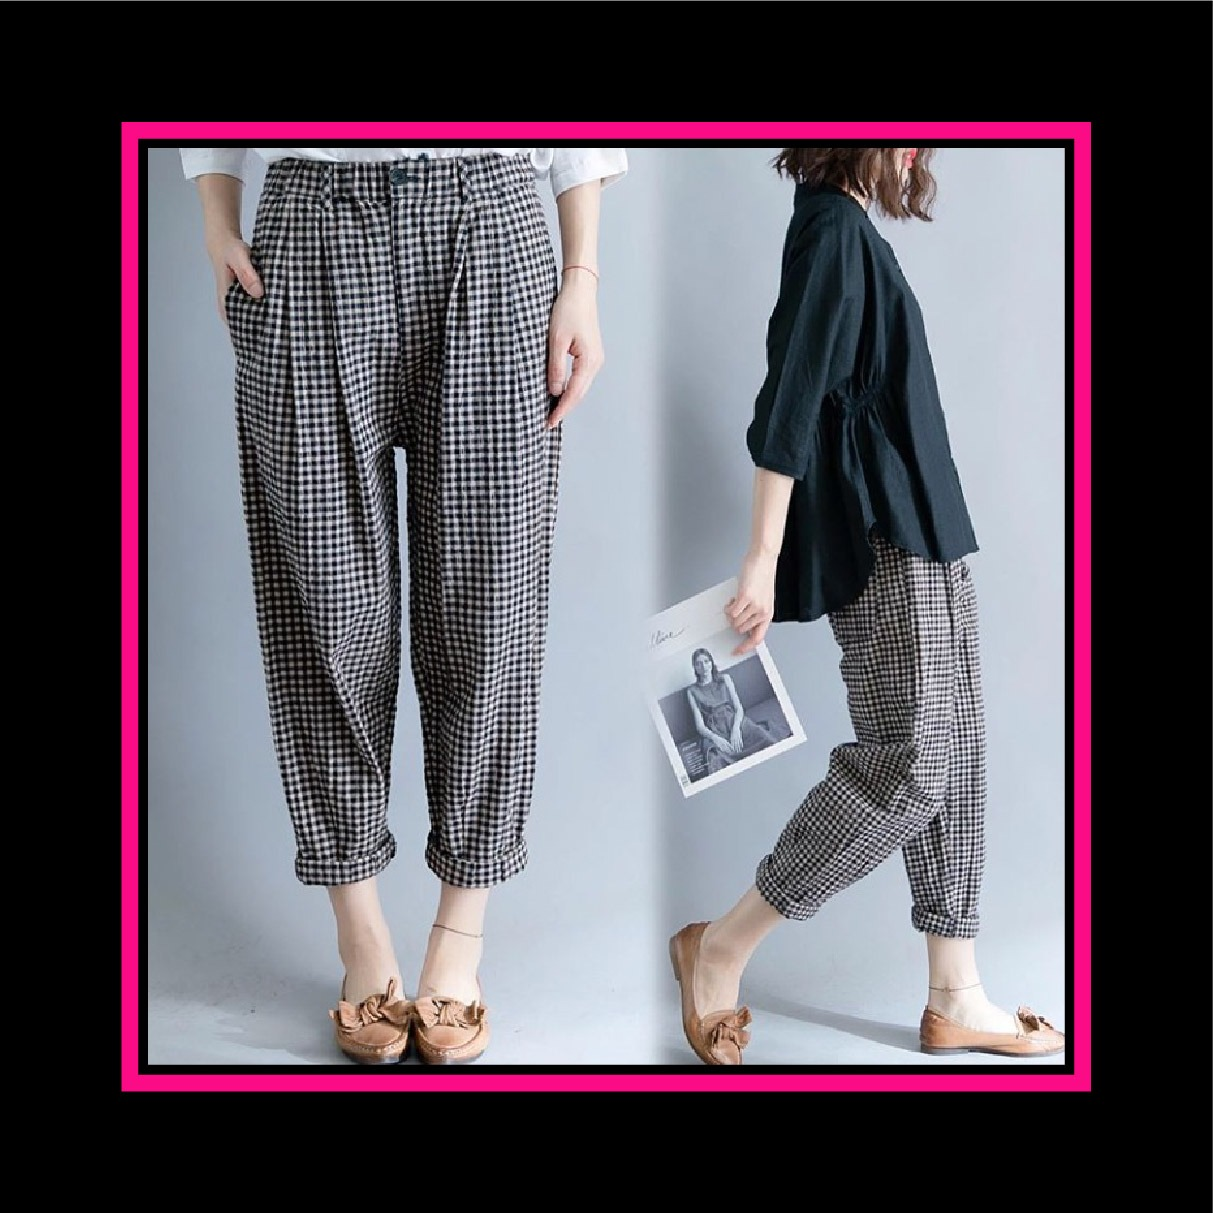 RICARDOF - Sweater Crop Basic / Sweater Wanita / Sweater Crop / Atasan Wanita / Sweater Korea / Fashion Terkini